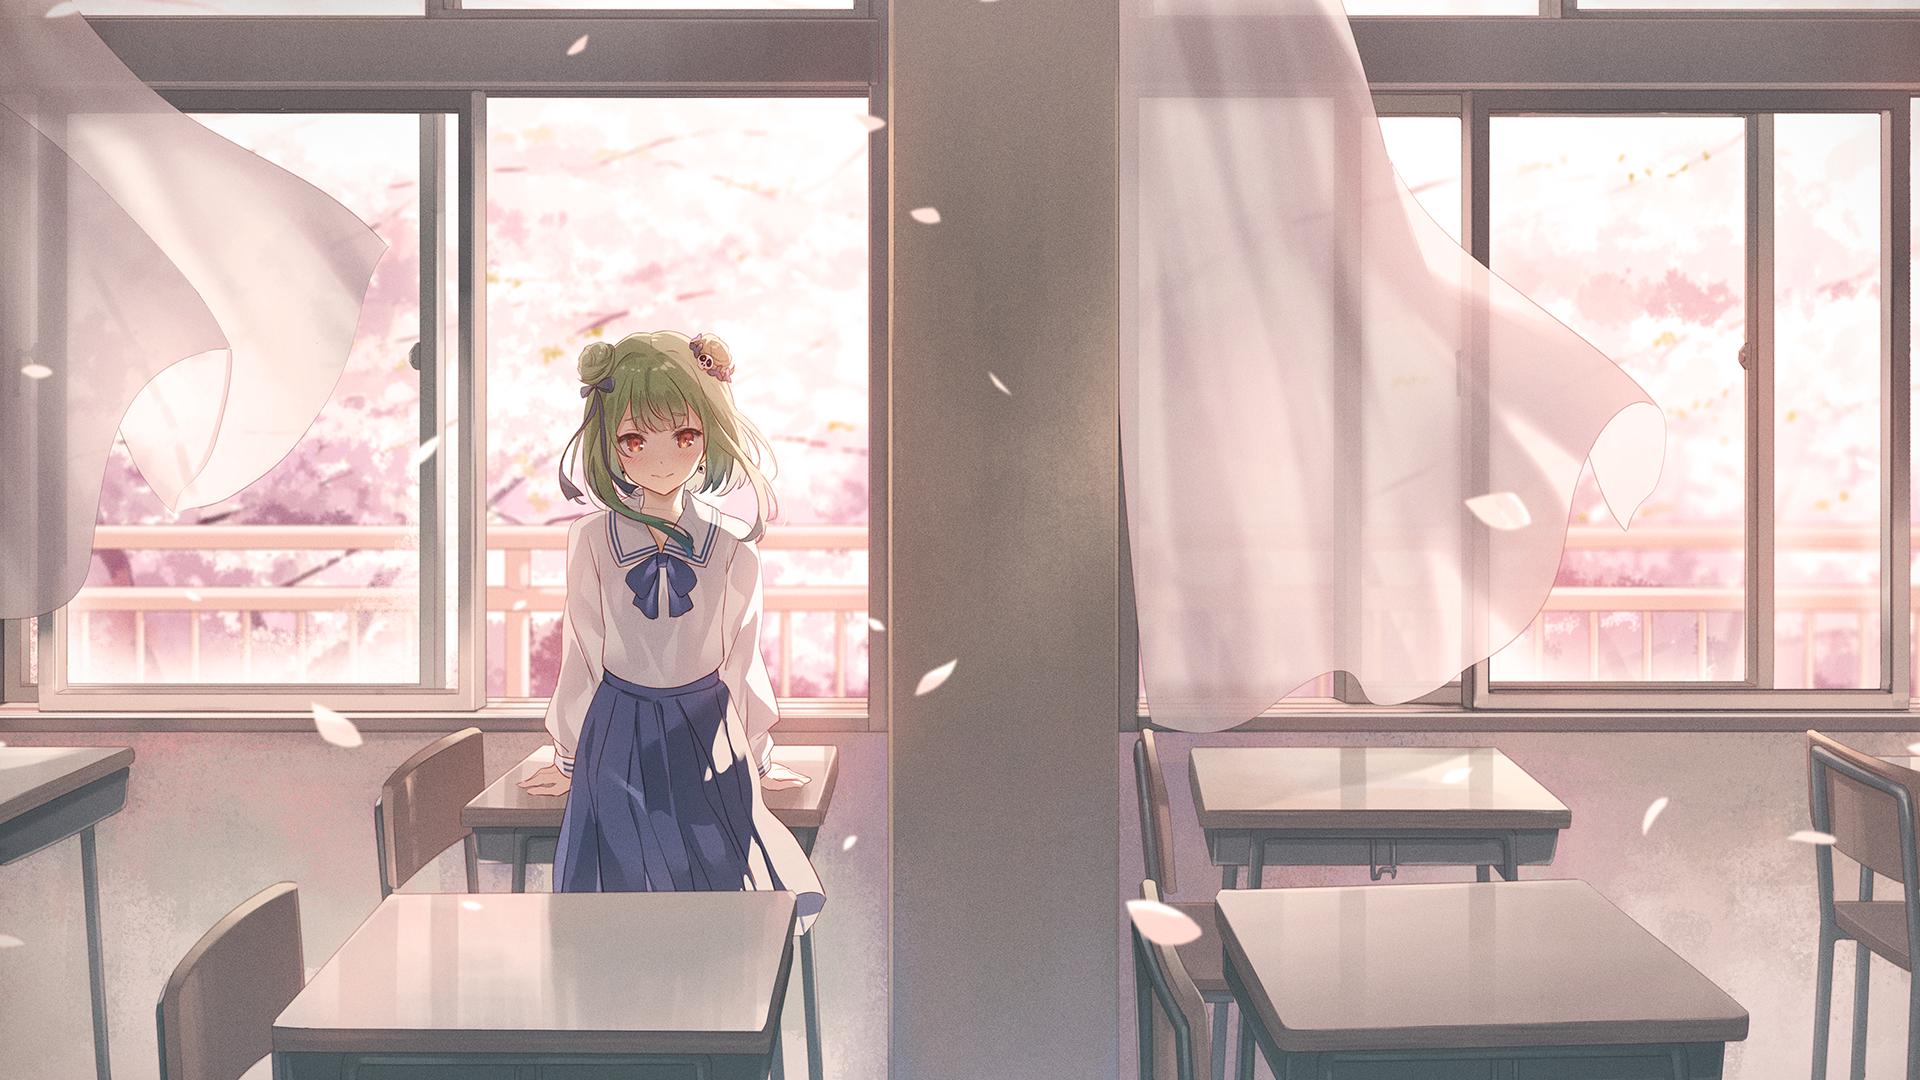 Anime 1920x1080 Uruha Rushia school uniform green hair windy red eyes classroom cherry blossom anime girls artwork Narumi Nanami Hololive Virtual Youtuber